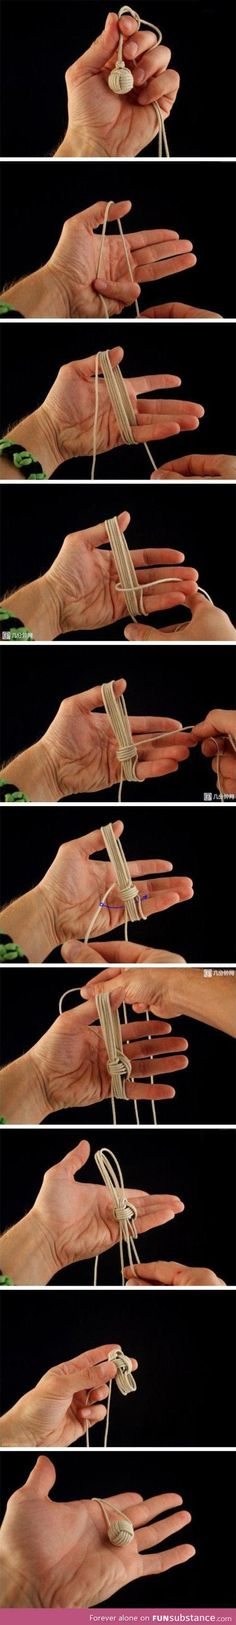 Diy chinese knot ball